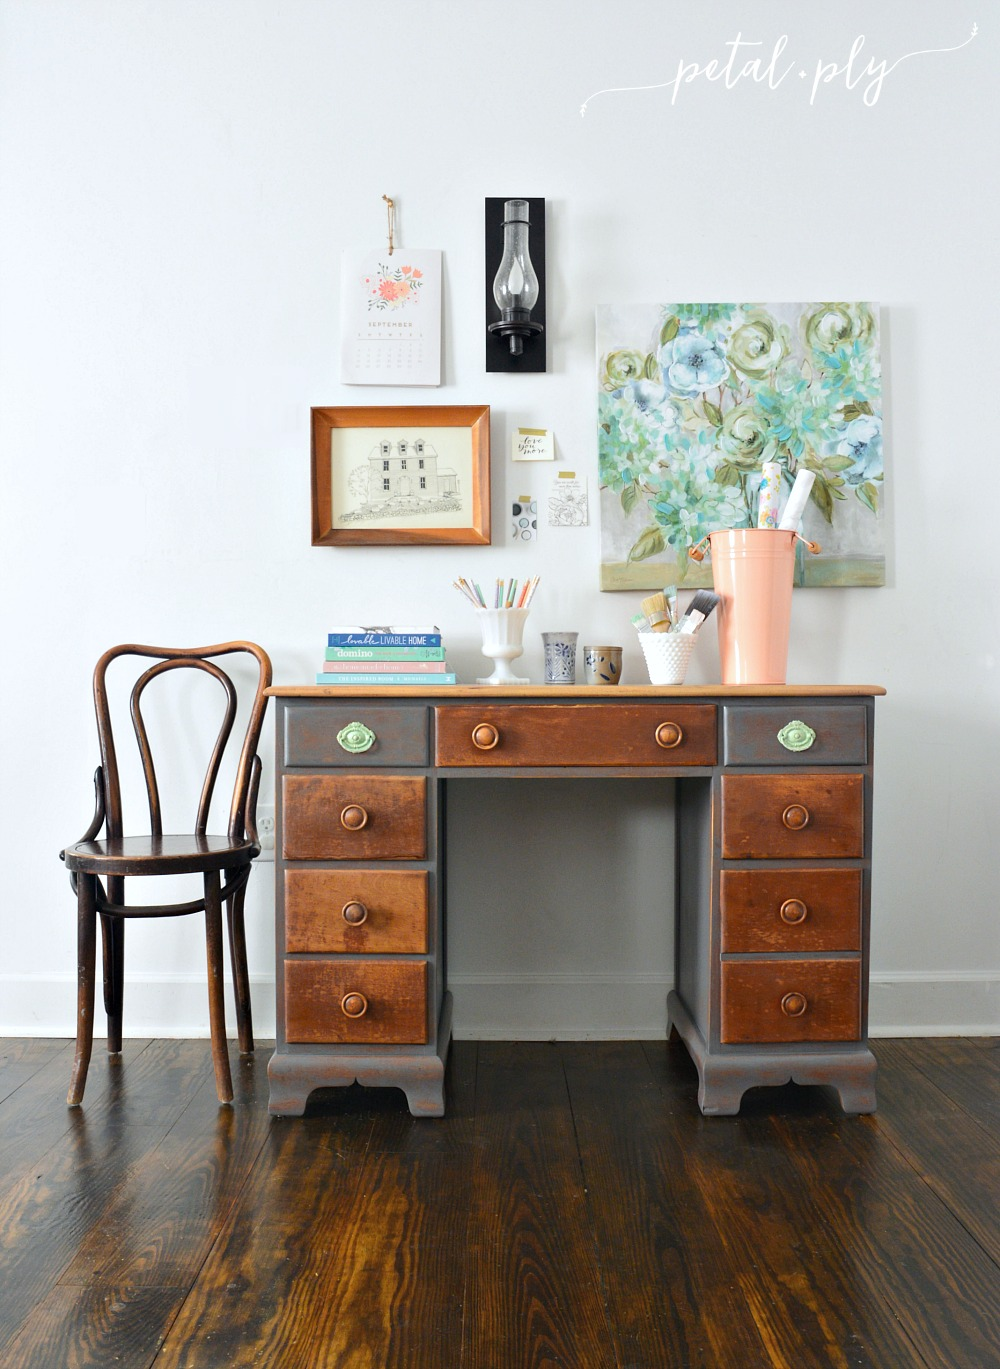 wm-driftwood-painted-two-tone-desk-redo